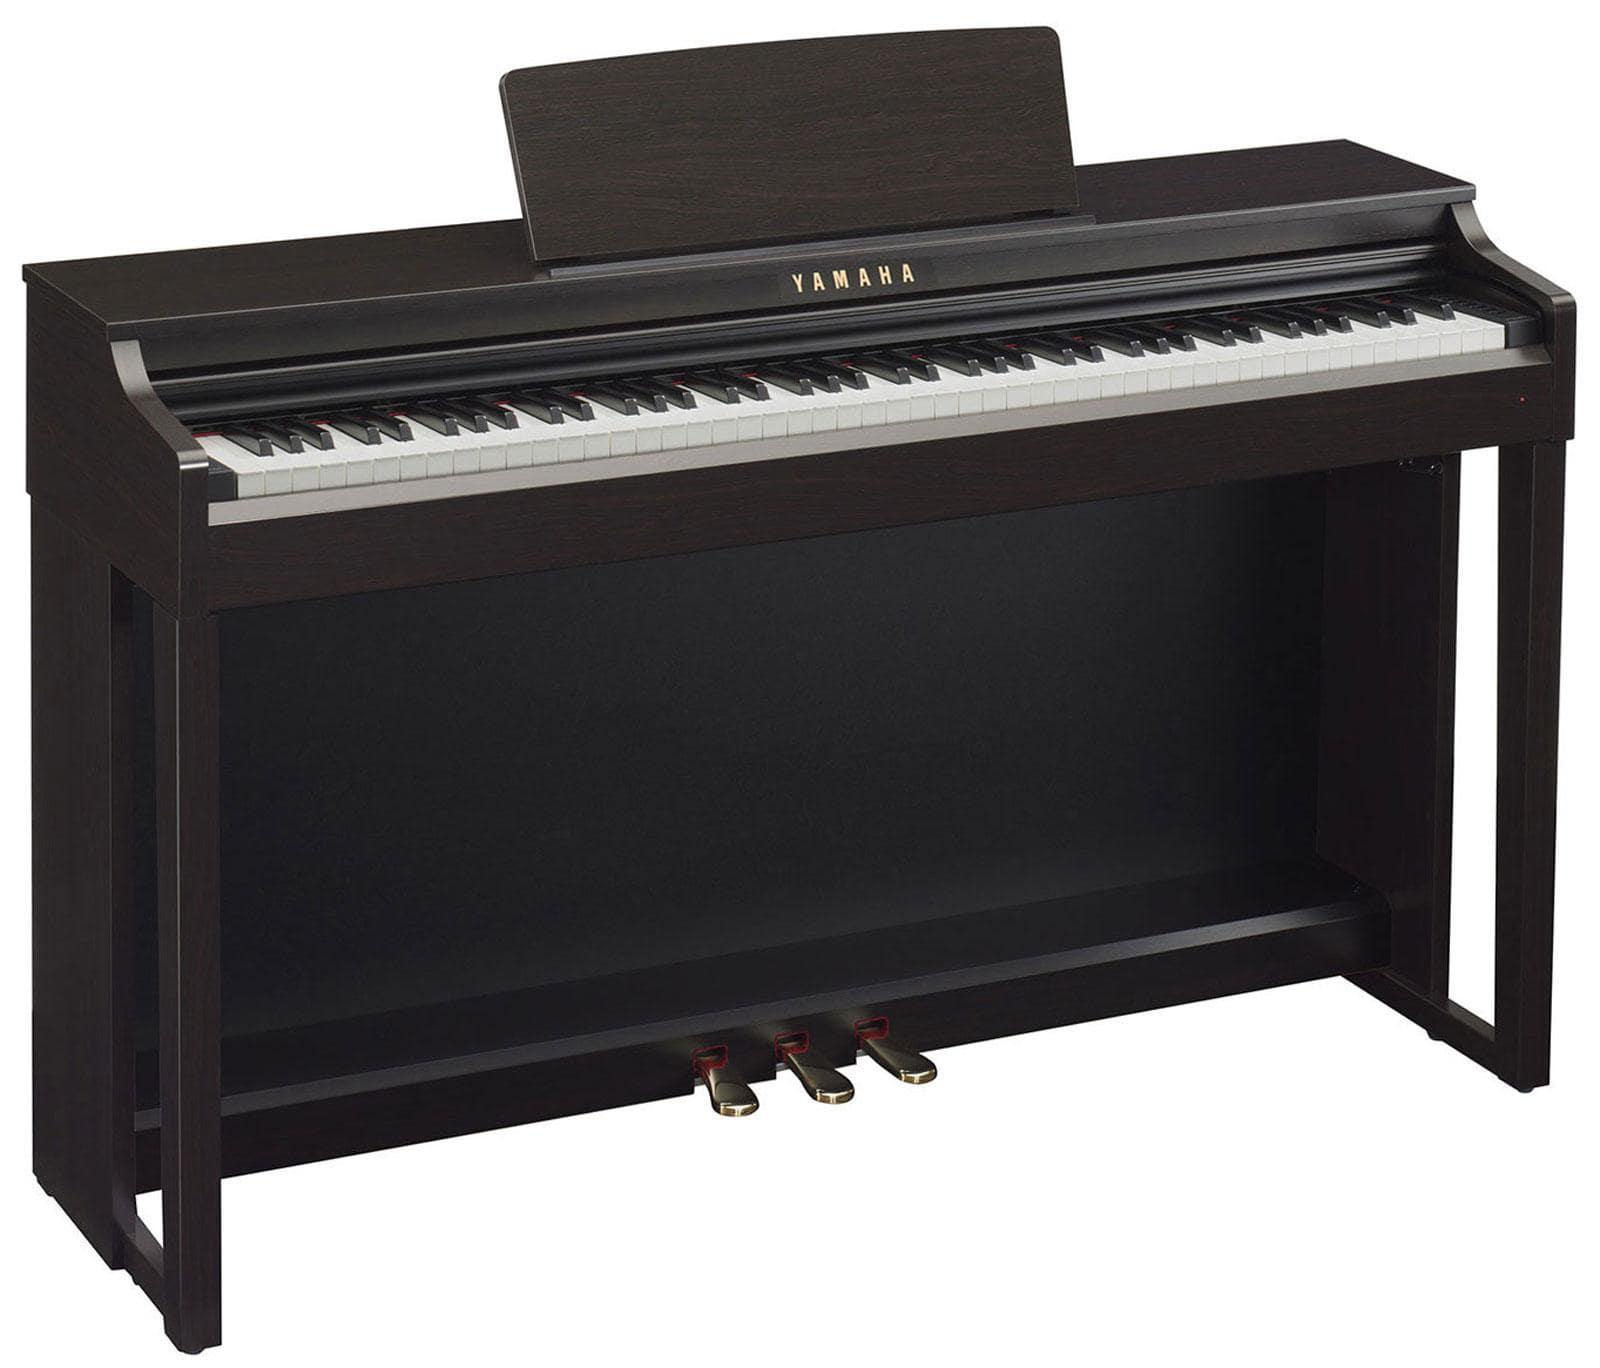 yamaha clp 625 r digitalpiano rosenholz. Black Bedroom Furniture Sets. Home Design Ideas